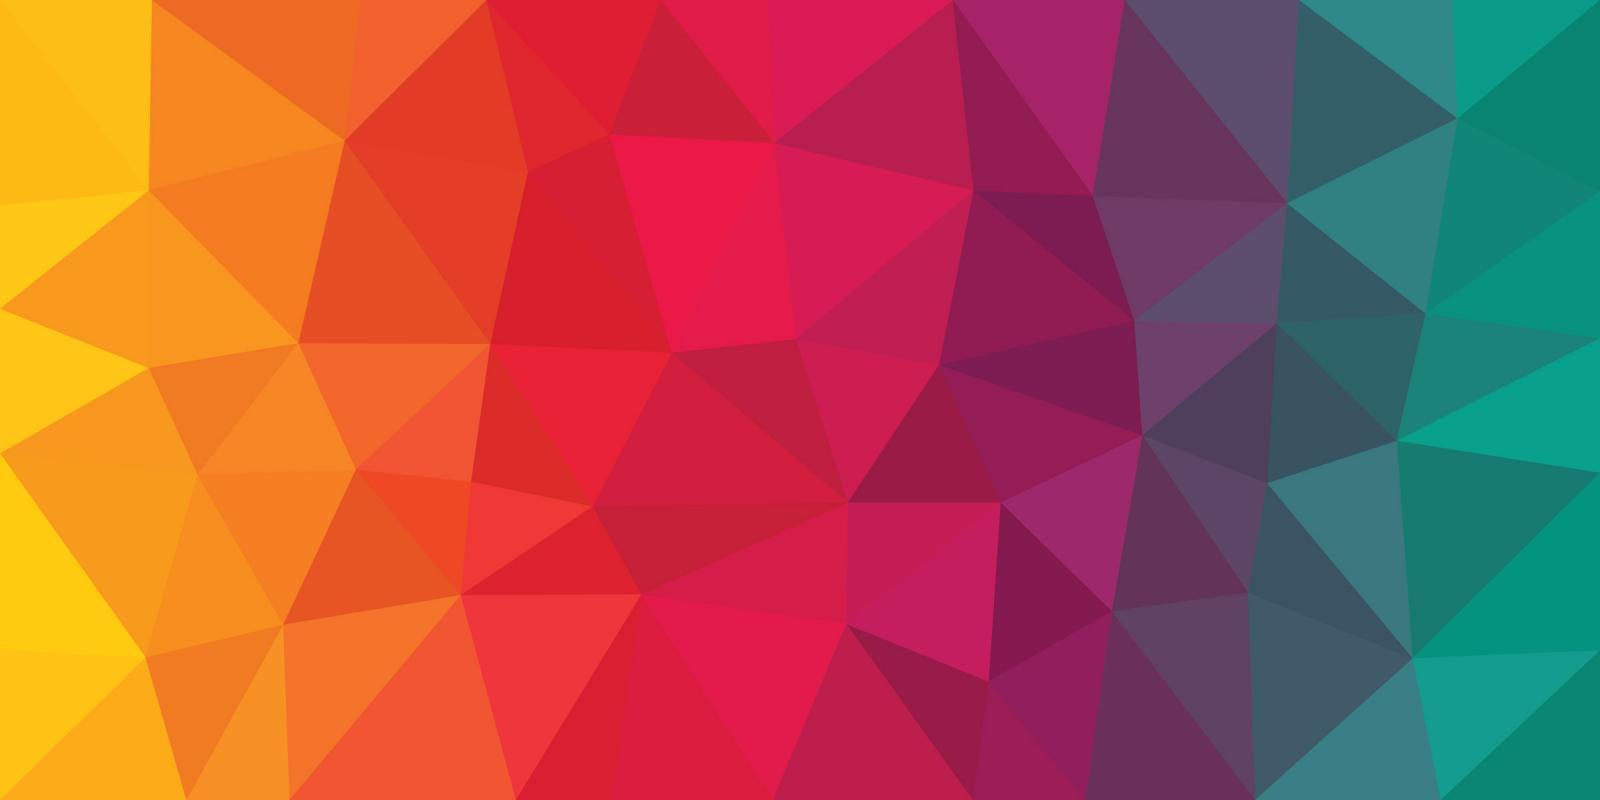 Rainbow background pattern geometric